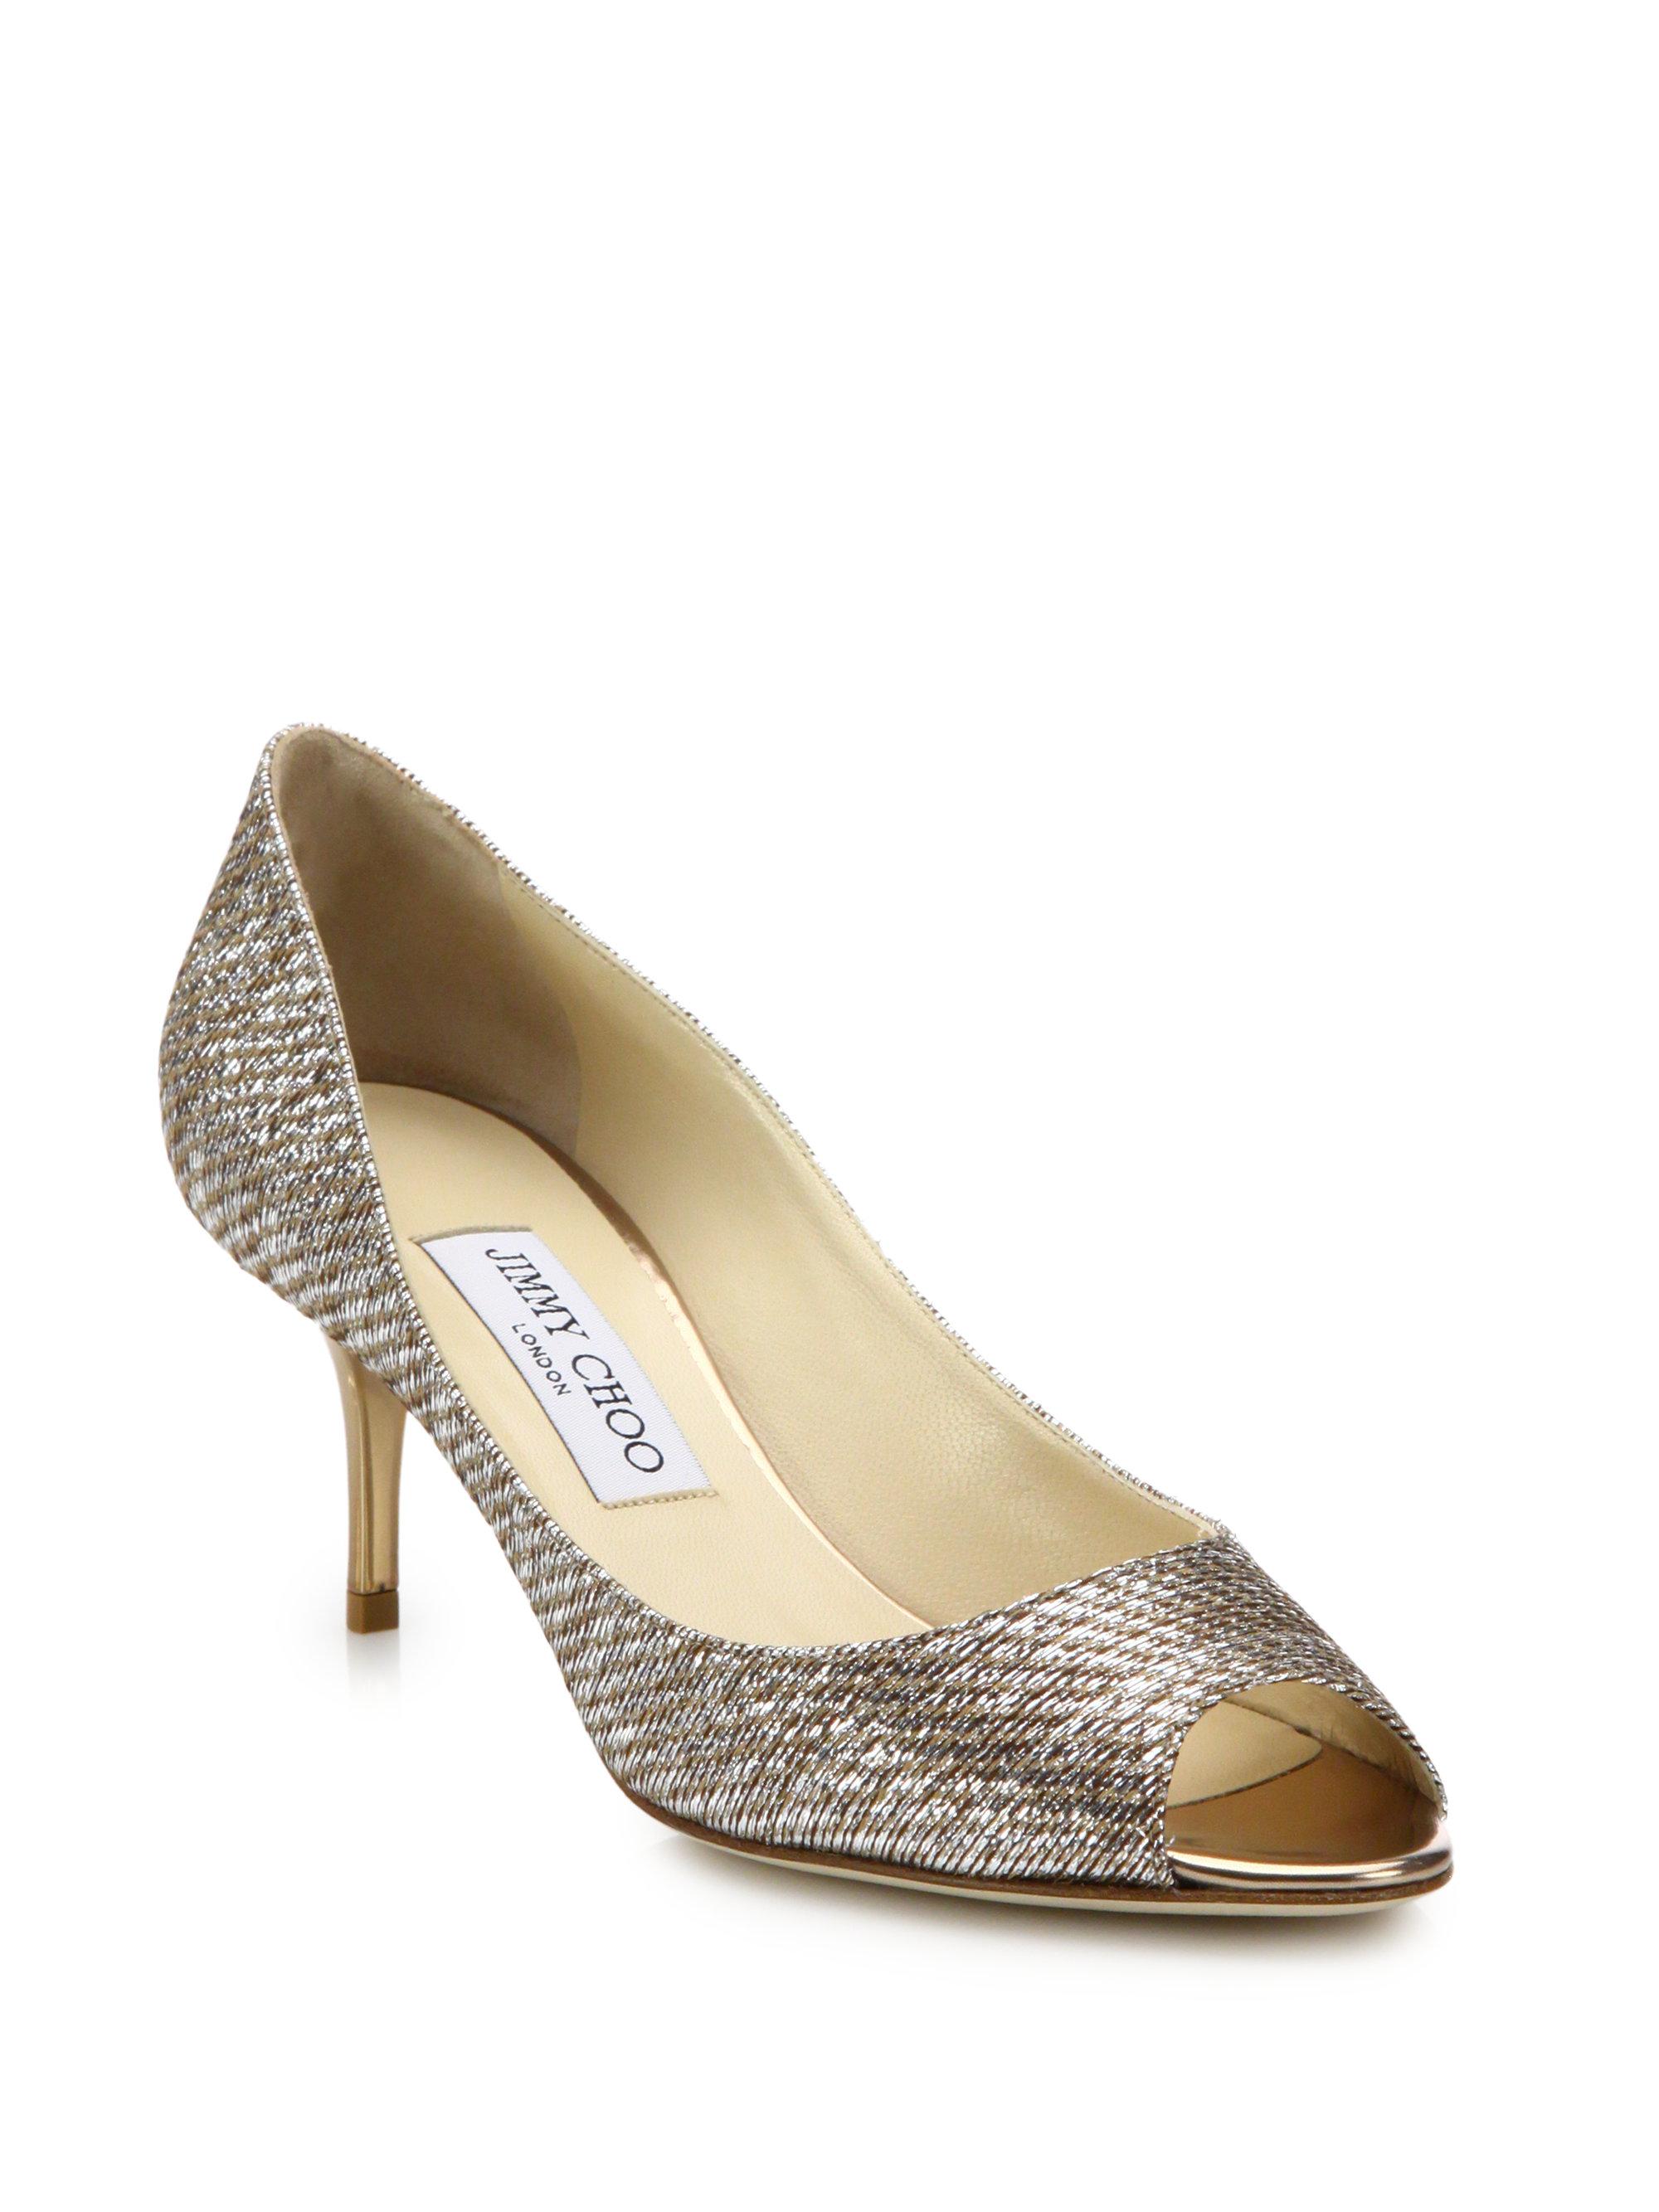 641cd1d55ed4 ... best lyst jimmy choo isabel 65 lamé mid heel peep toe pumps in metallic  0cfe9 7c32b